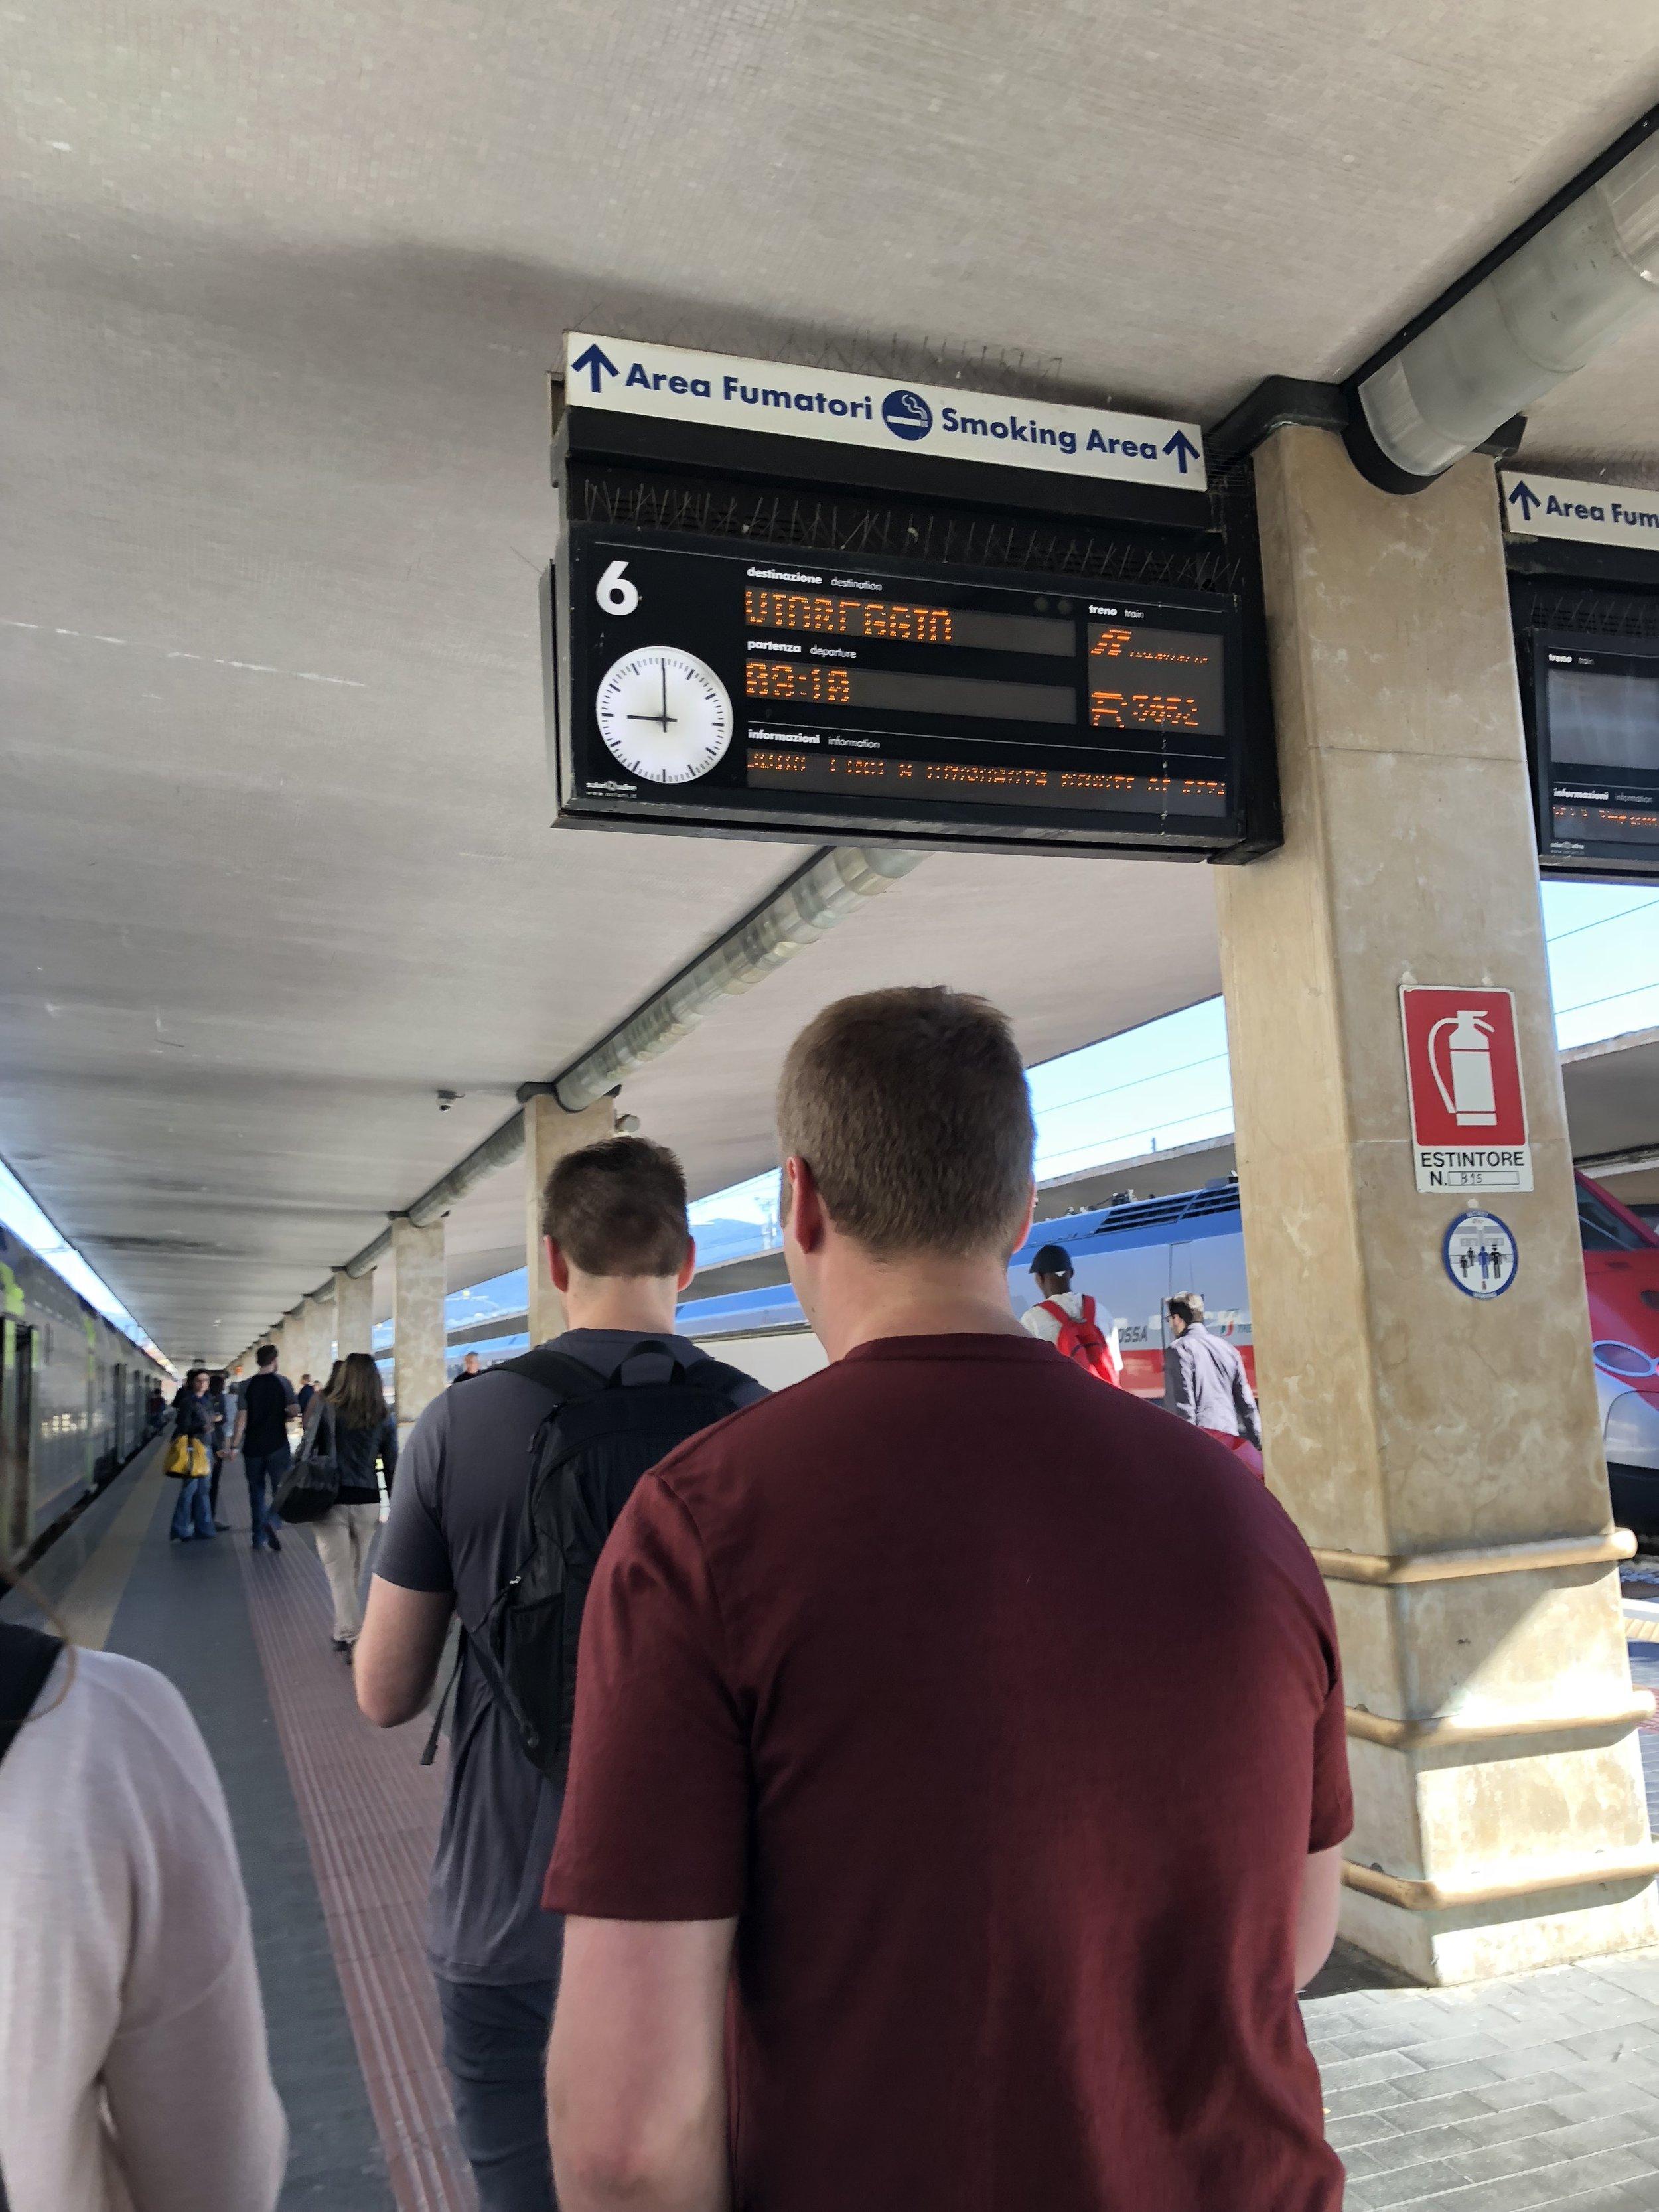 Train platforms at Florence's SMN train station